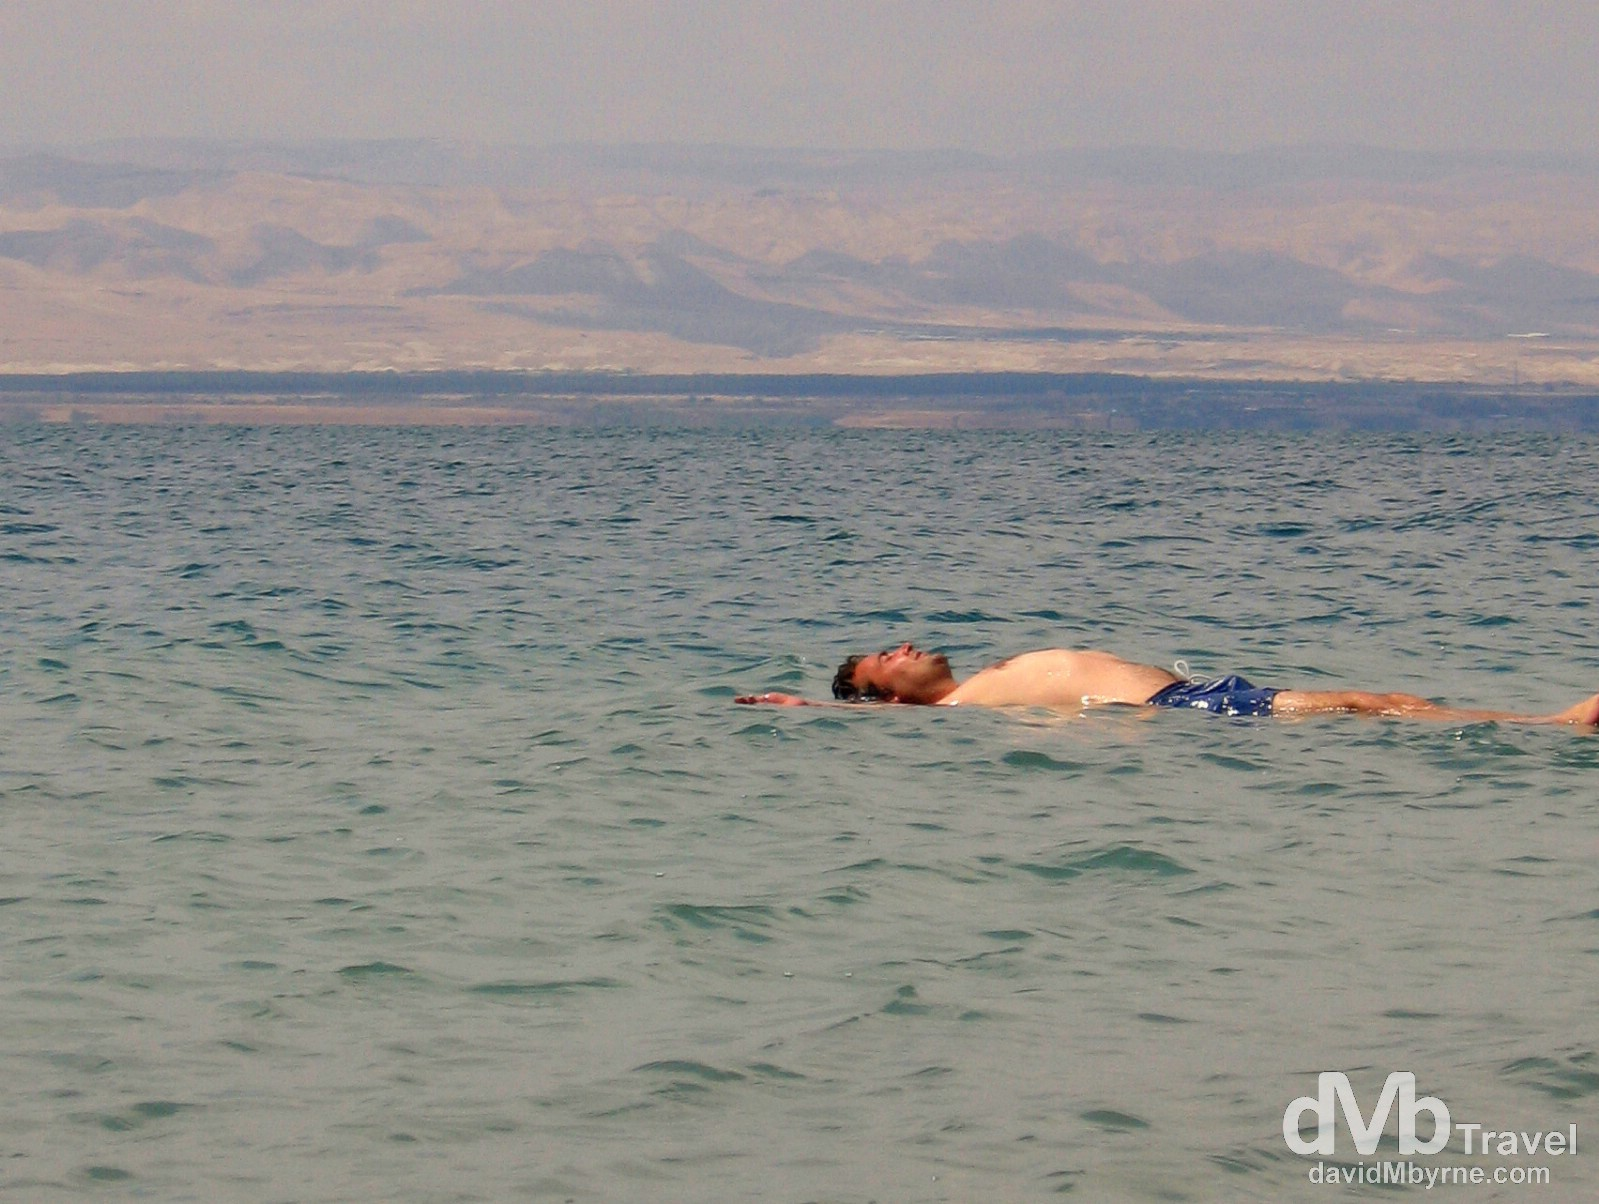 Floating in the Dead Sea in Jordan. April 29, 2008.